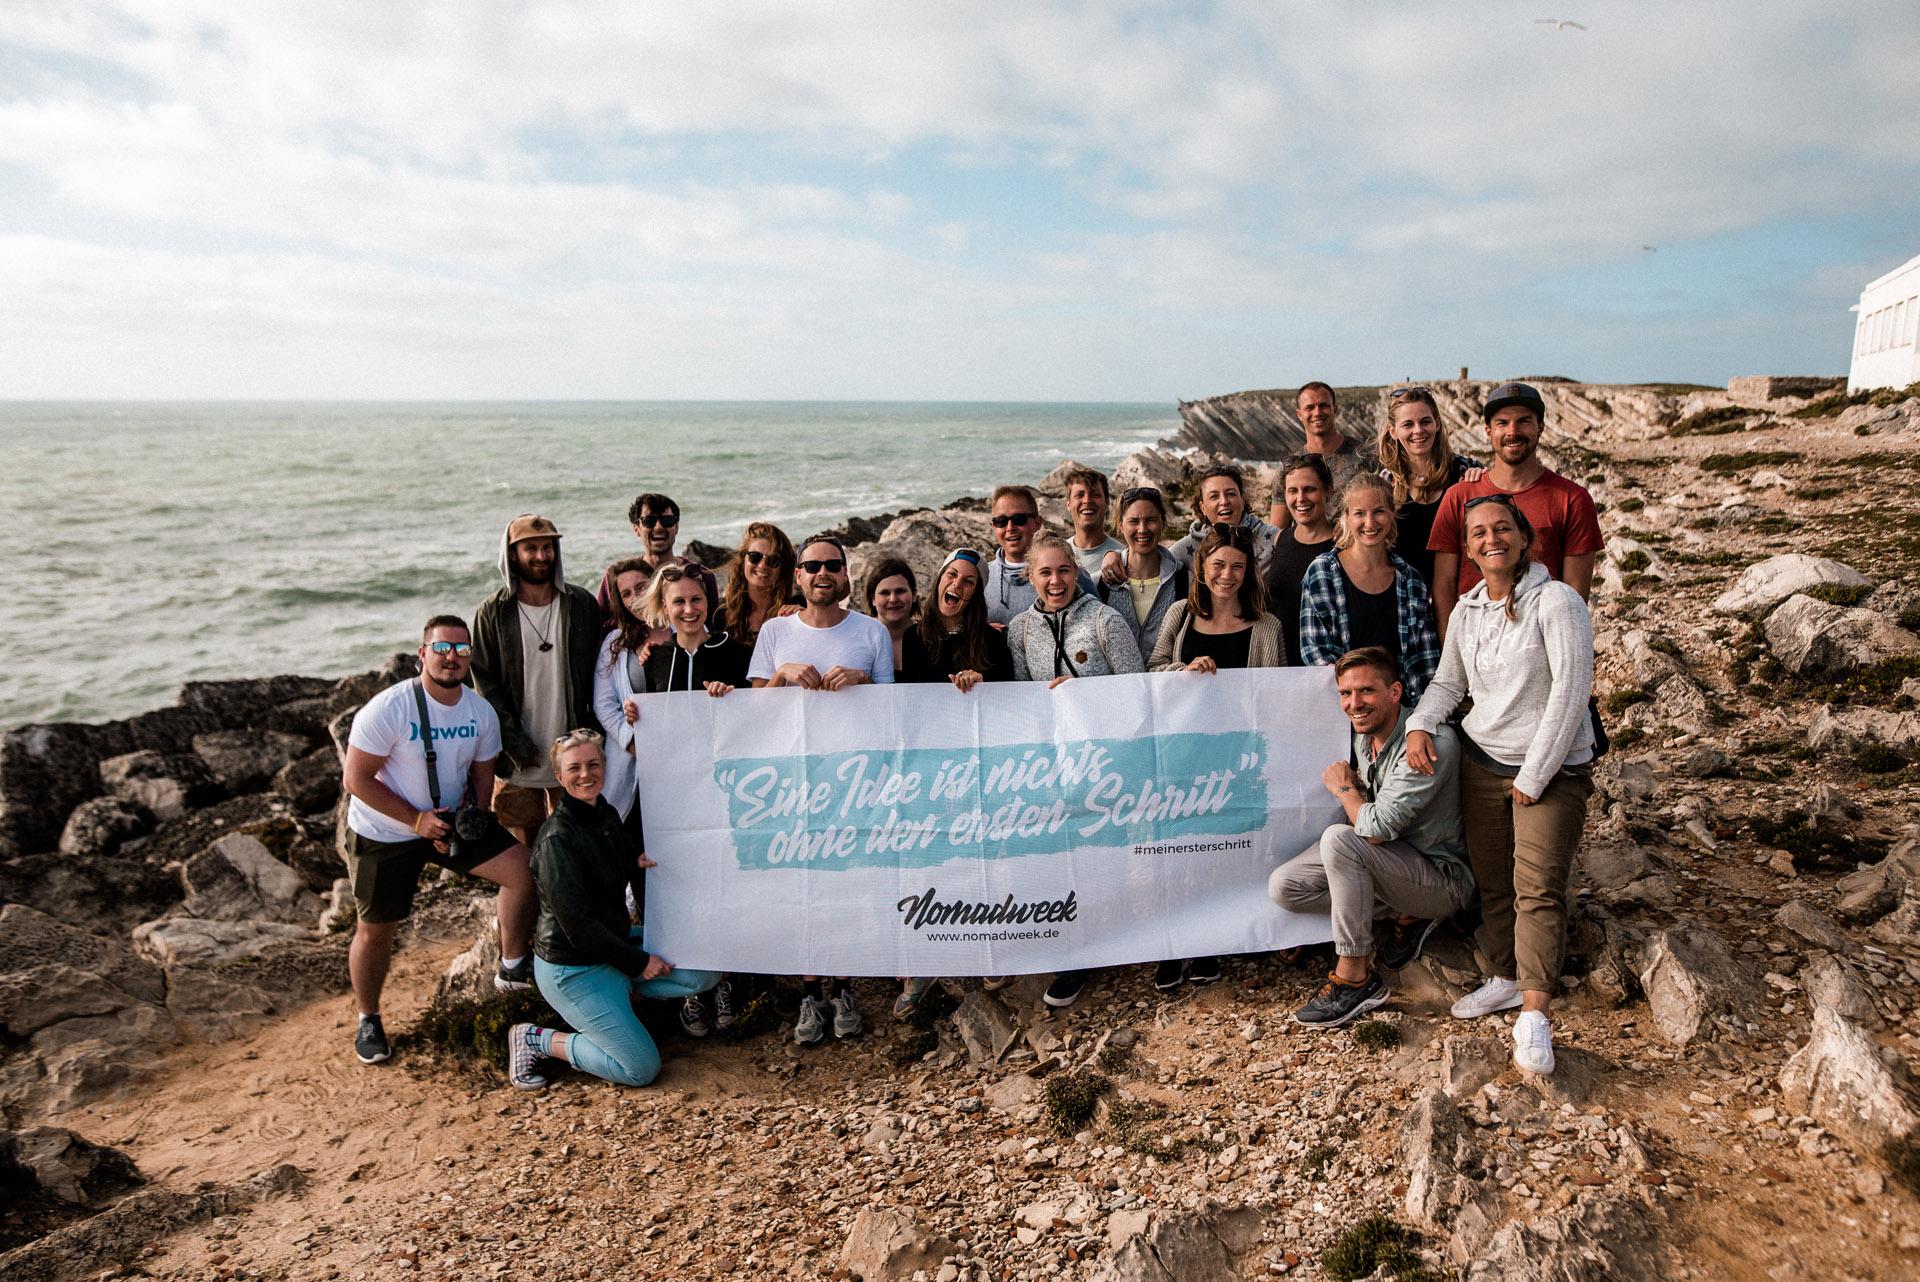 Portugal-Gruppenfoto-Nomadweek-Digitalenomaden.jpg